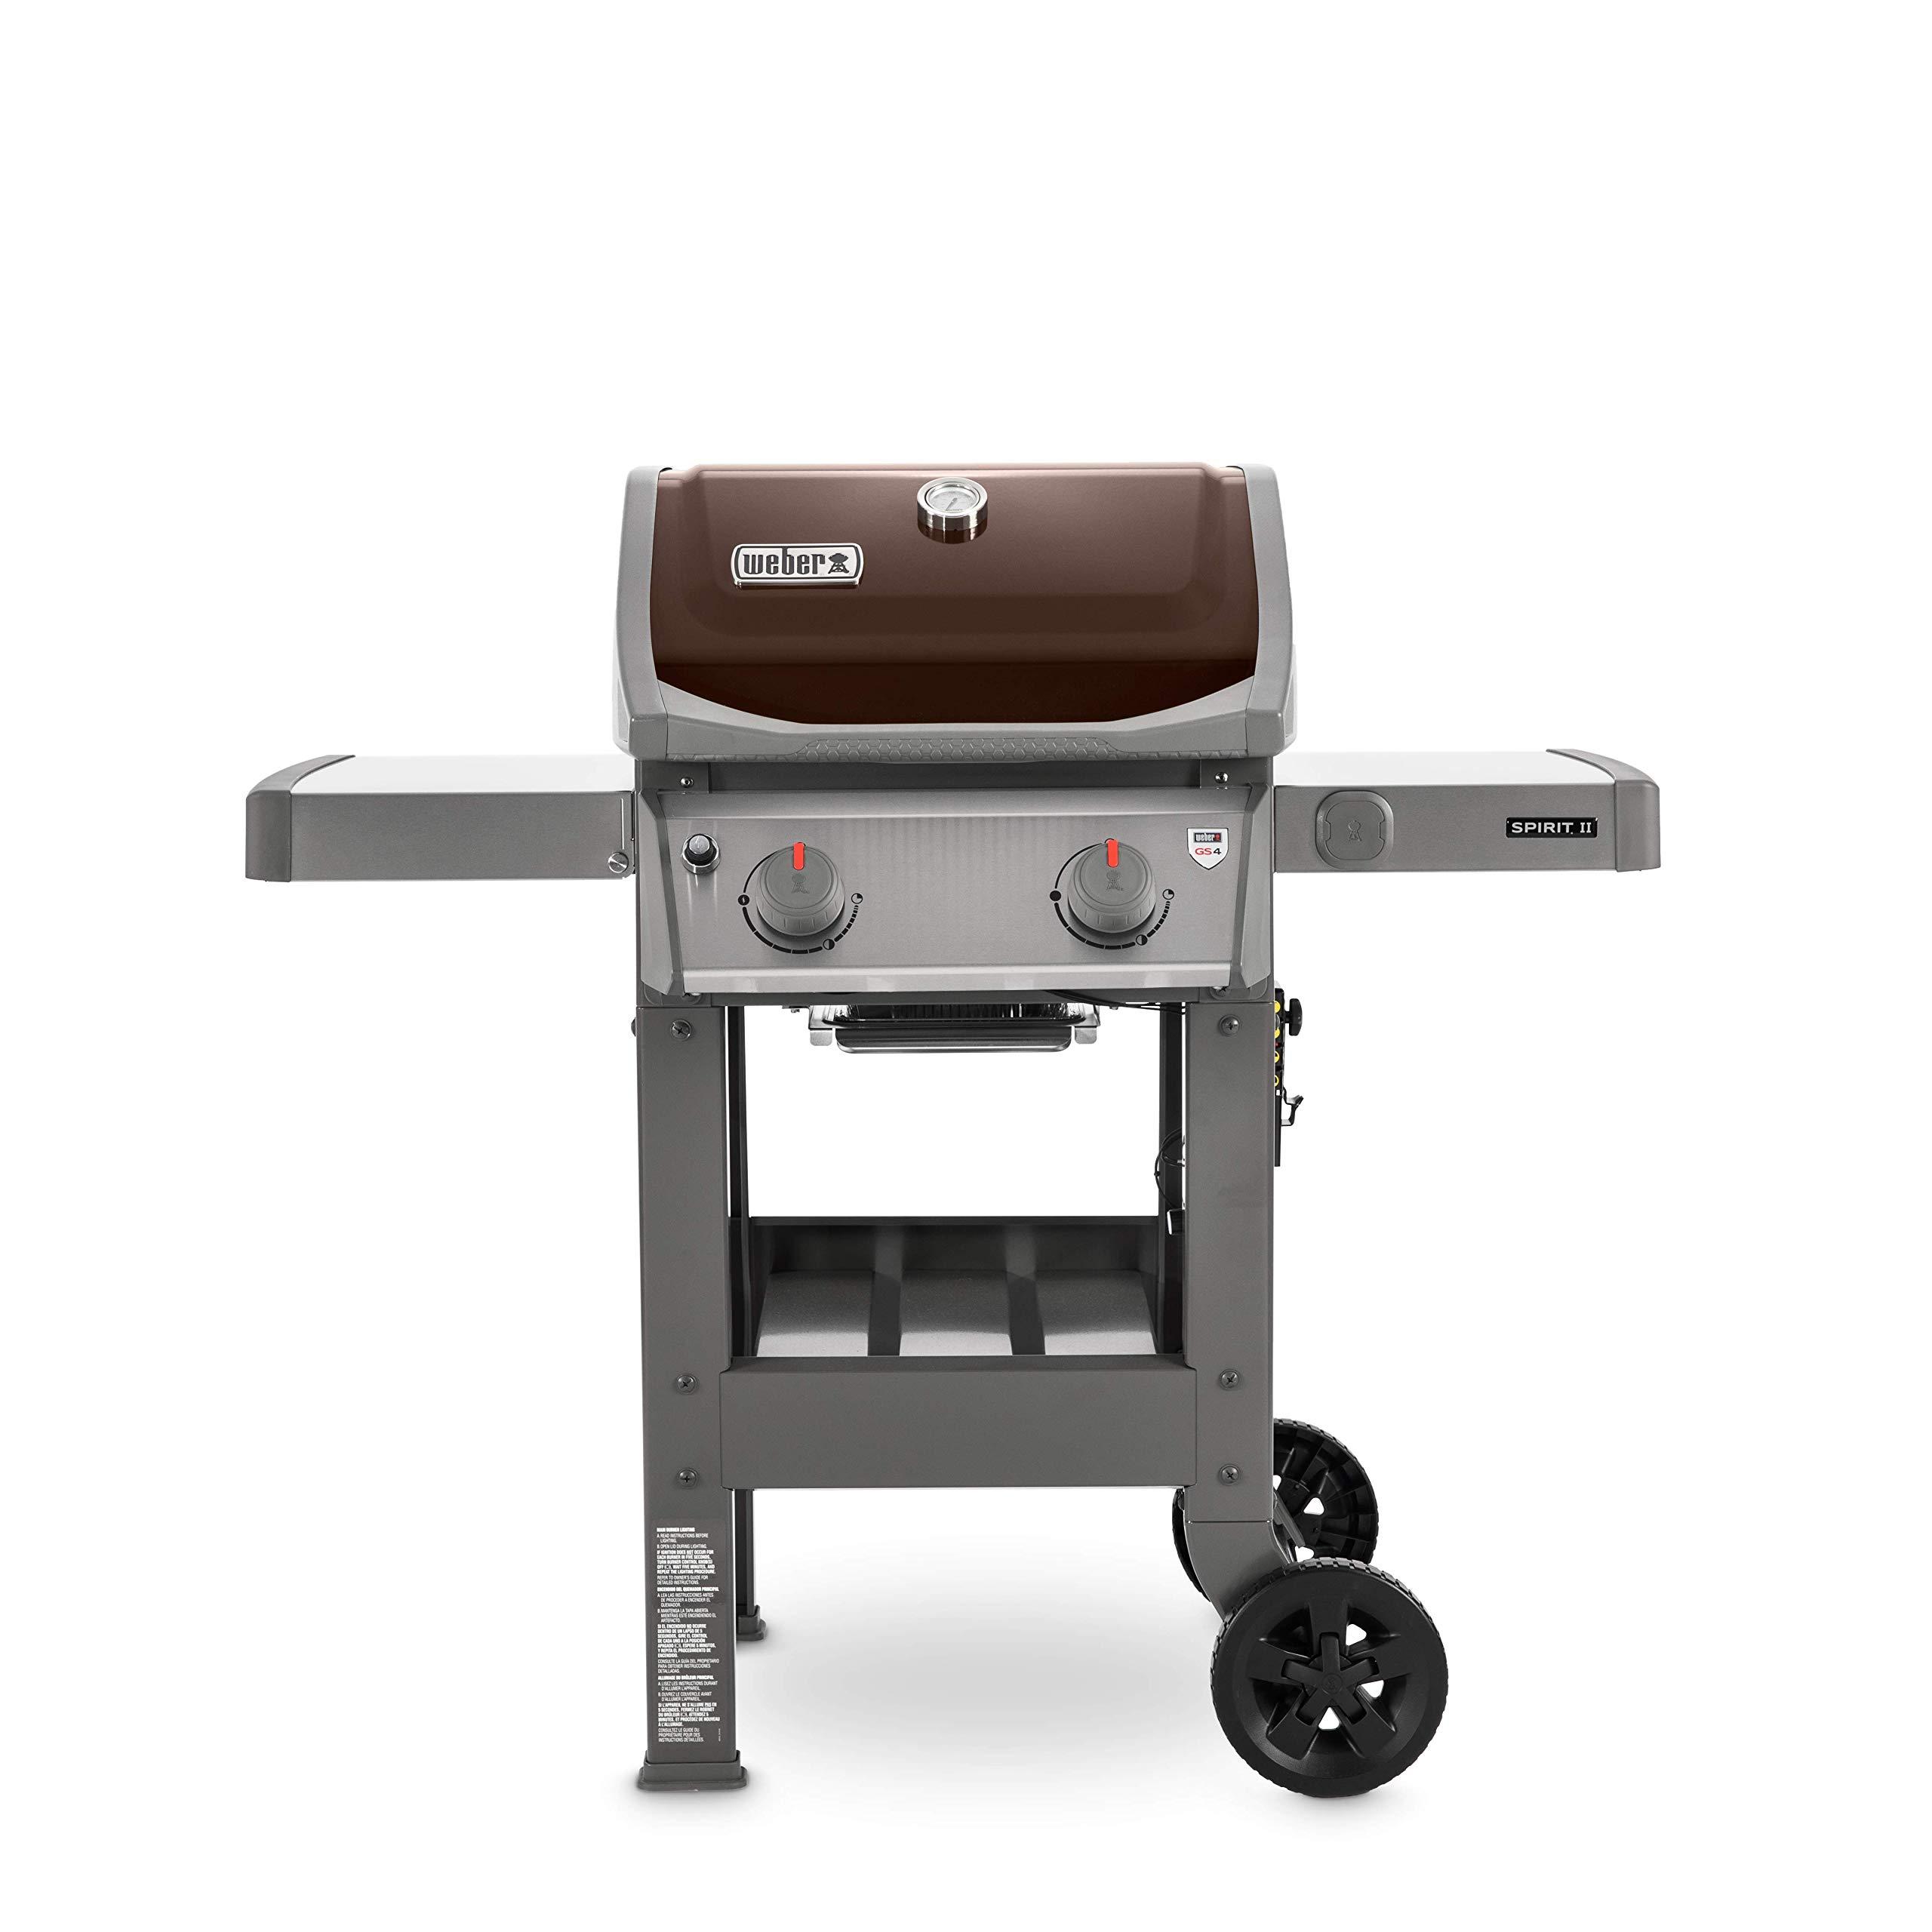 Weber 44070001 Spirit II E-210 2-Burner Liquid Propane Grill, Mocha by Weber